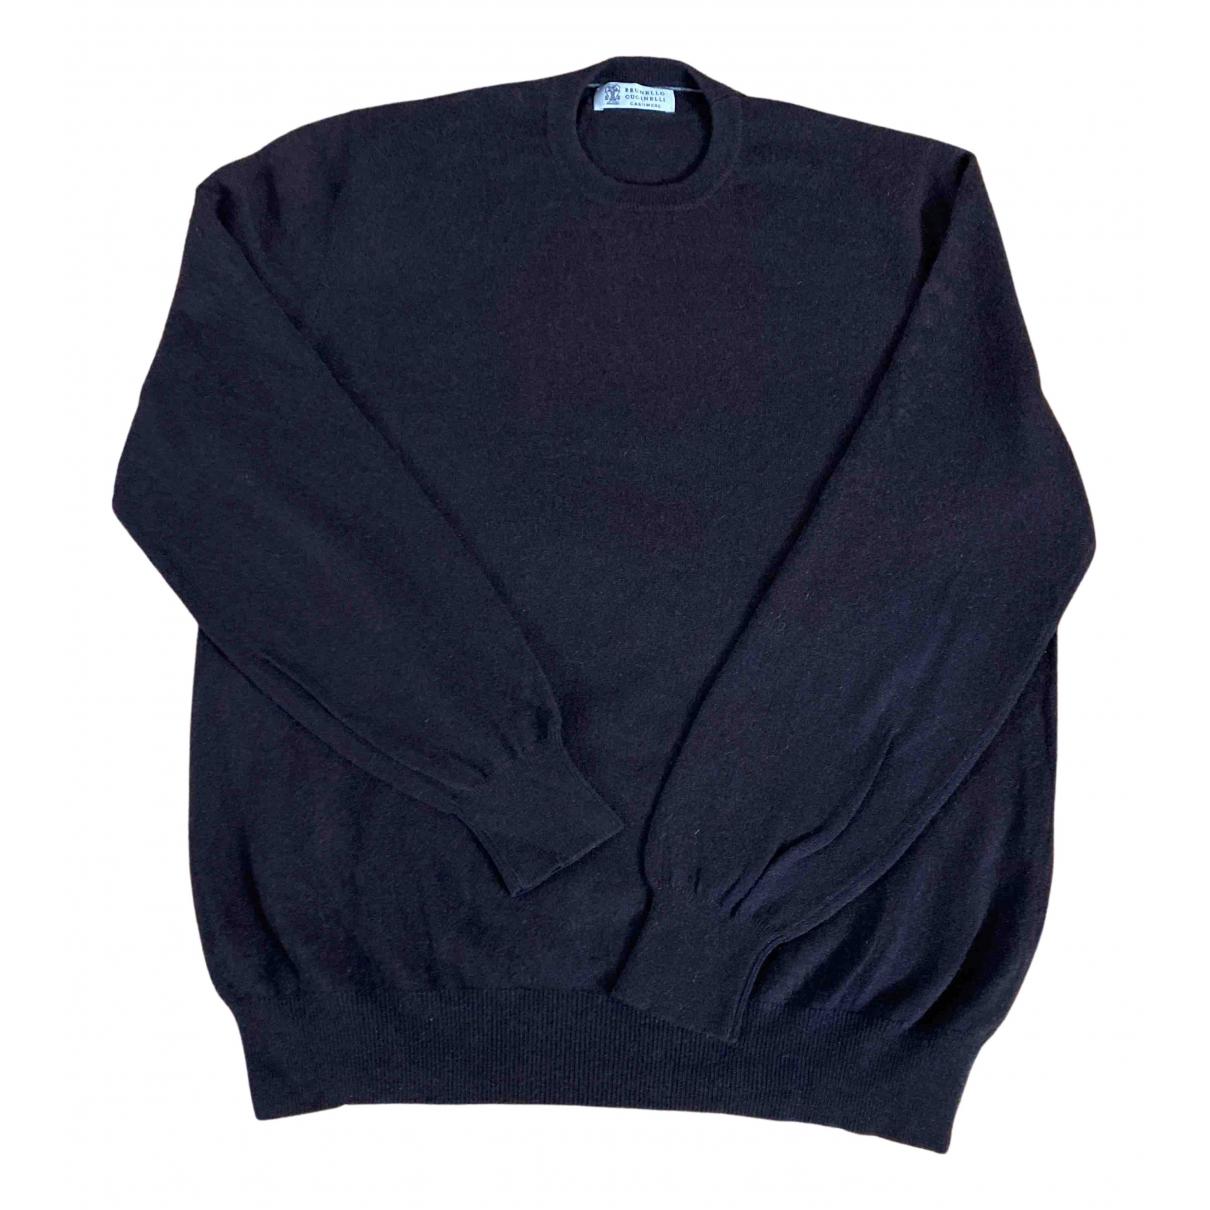 Brunello Cucinelli N Brown Cashmere Knitwear & Sweatshirts for Men 54 IT